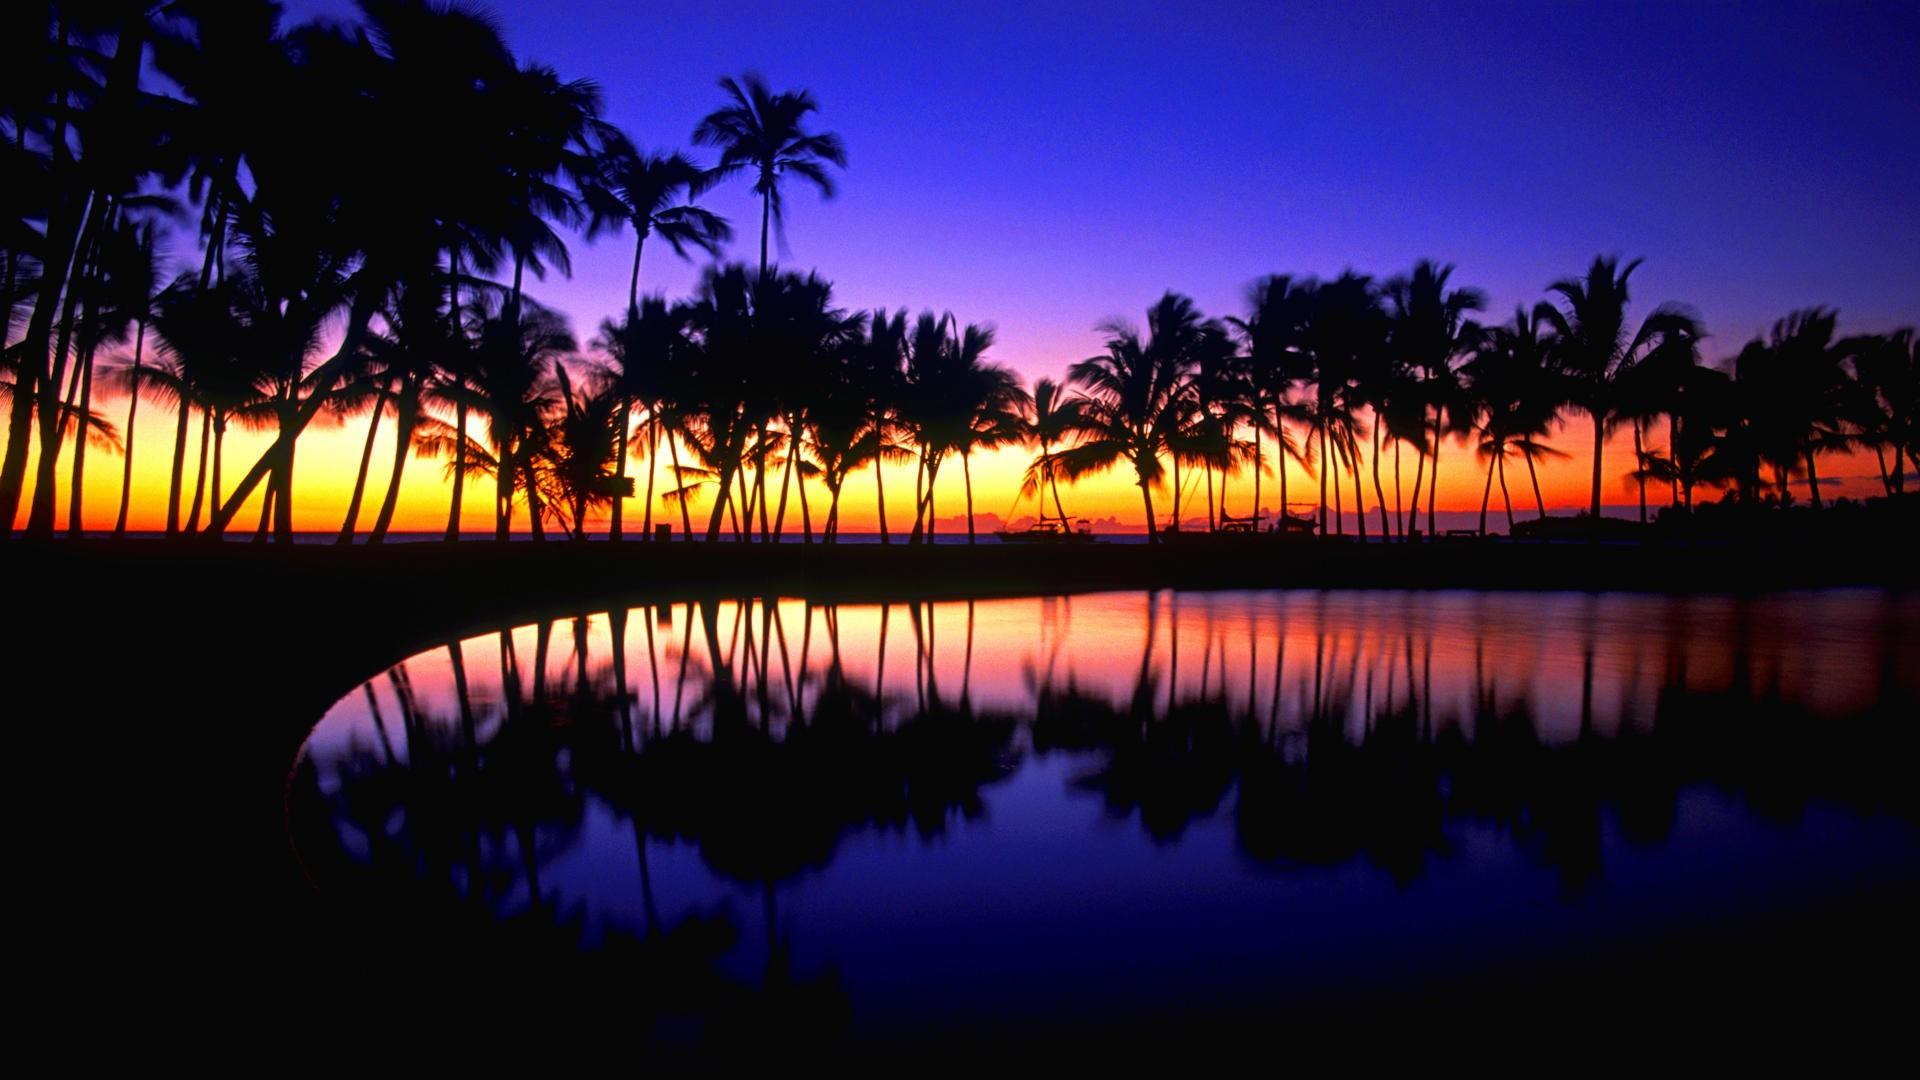 Hawaii Tropical Wallpaper 1920x1080 Hawaii Tropical Reflections 1920x1080